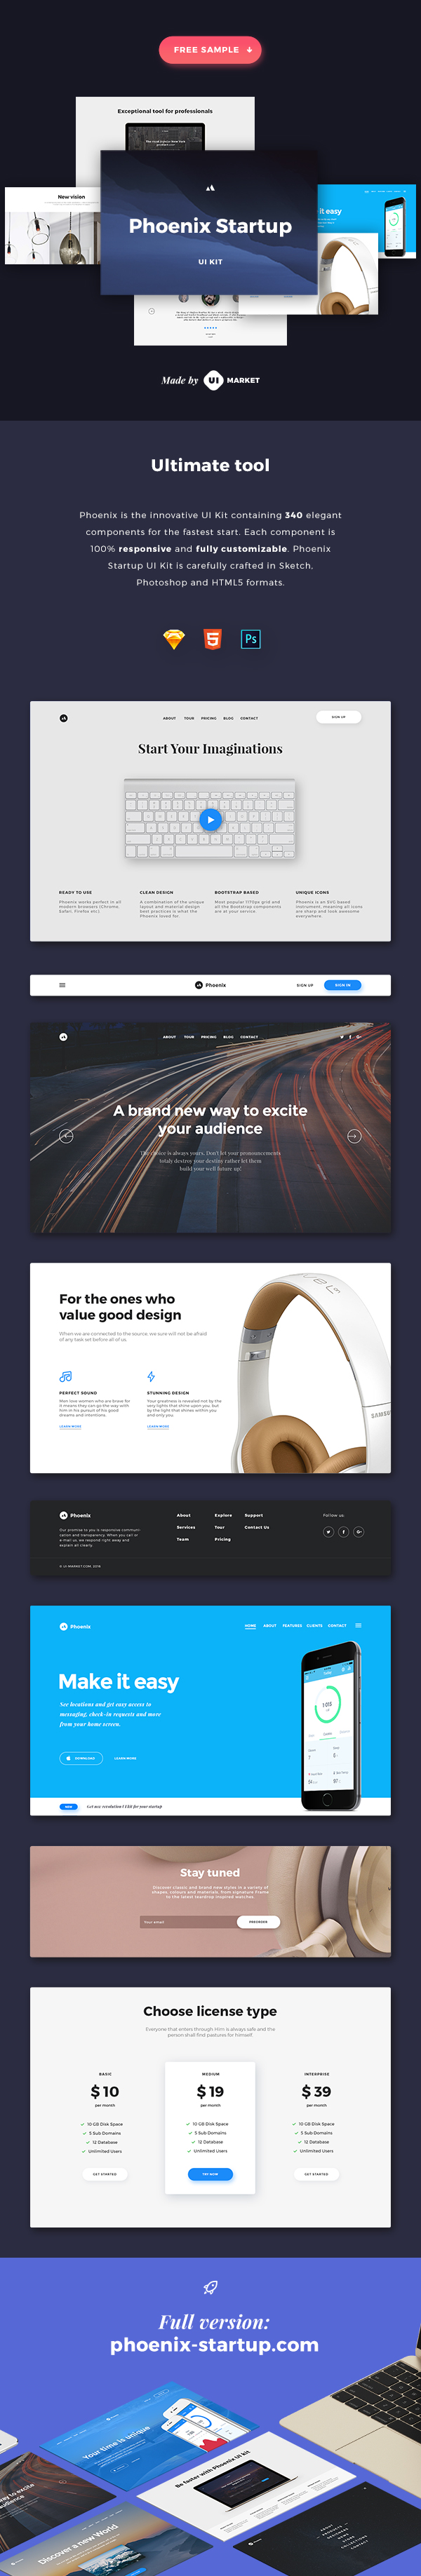 Phoenix Startup UI Kit – Free Sample